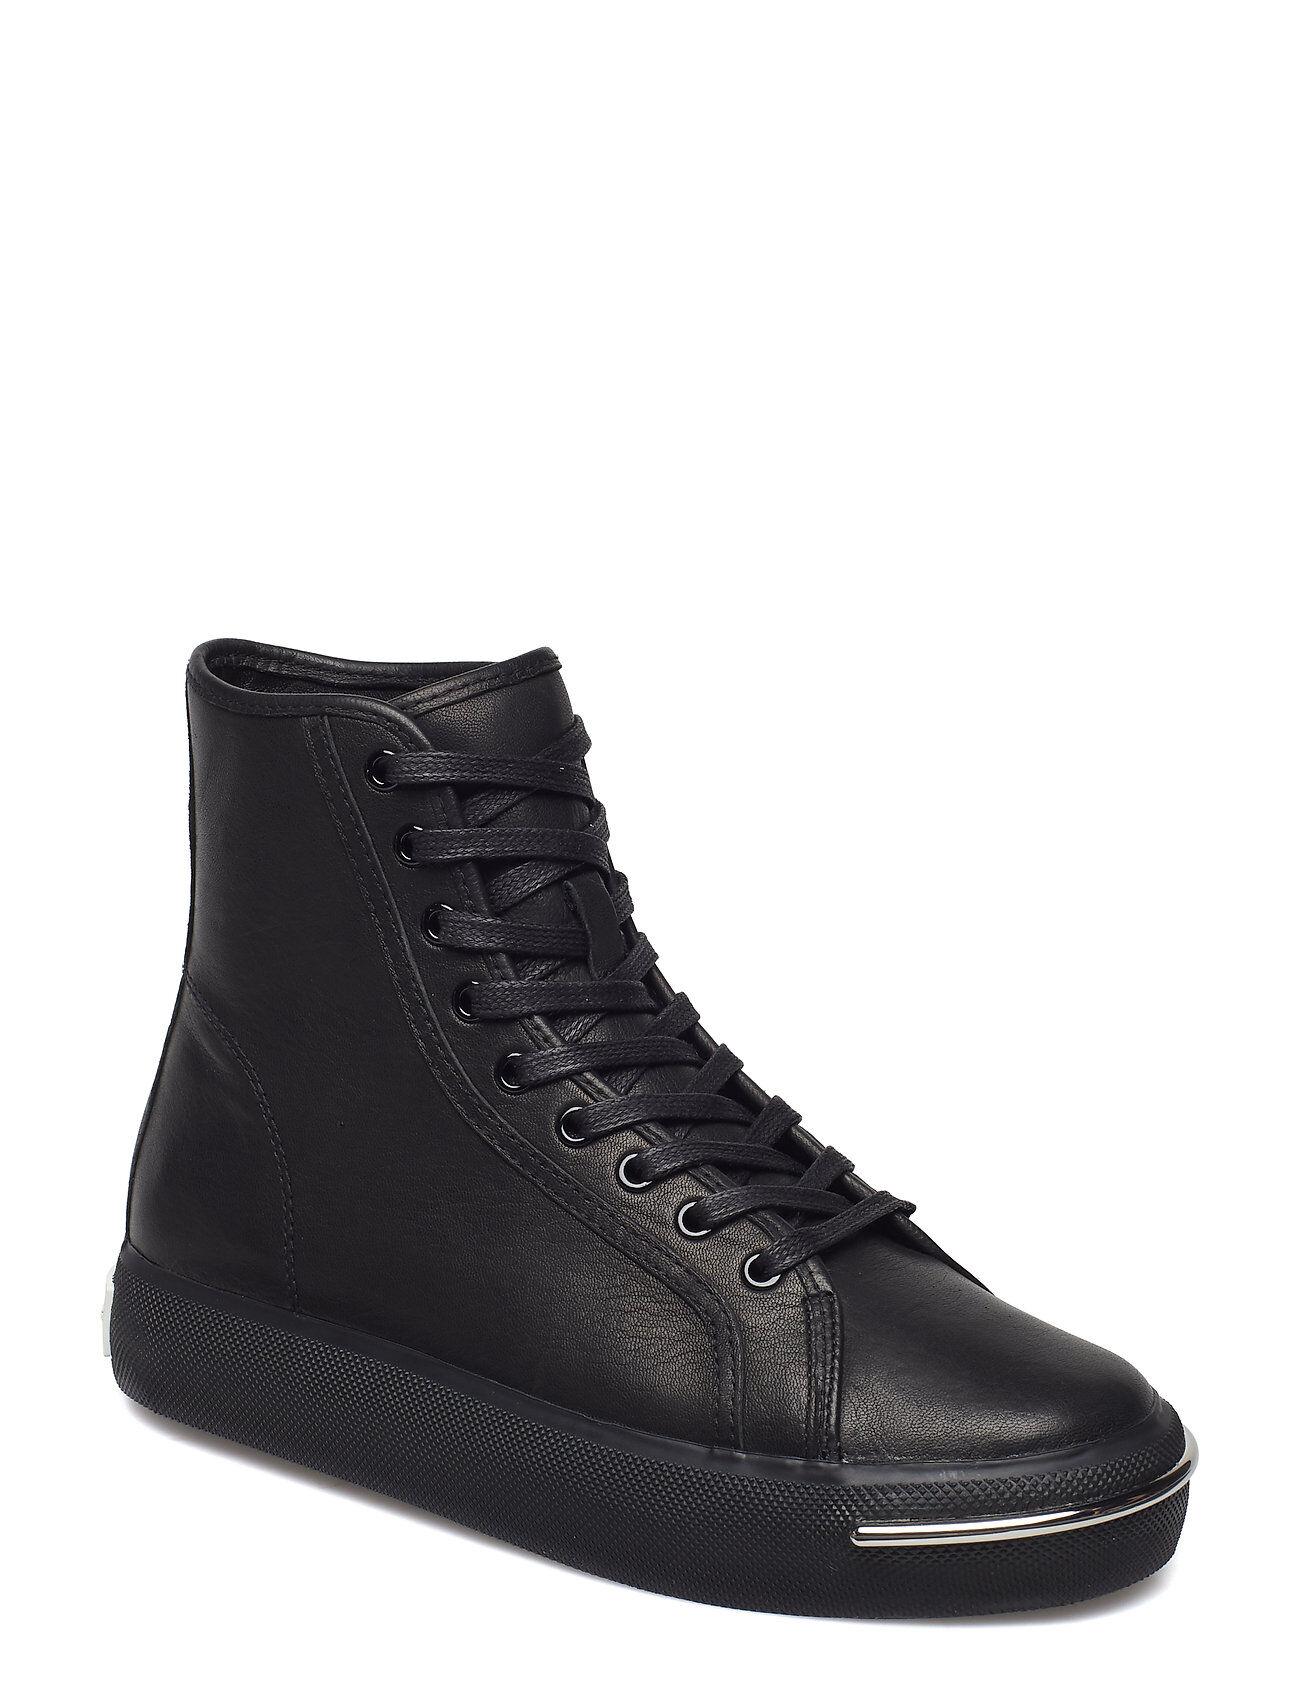 Alexander Wang Pia Black Leather